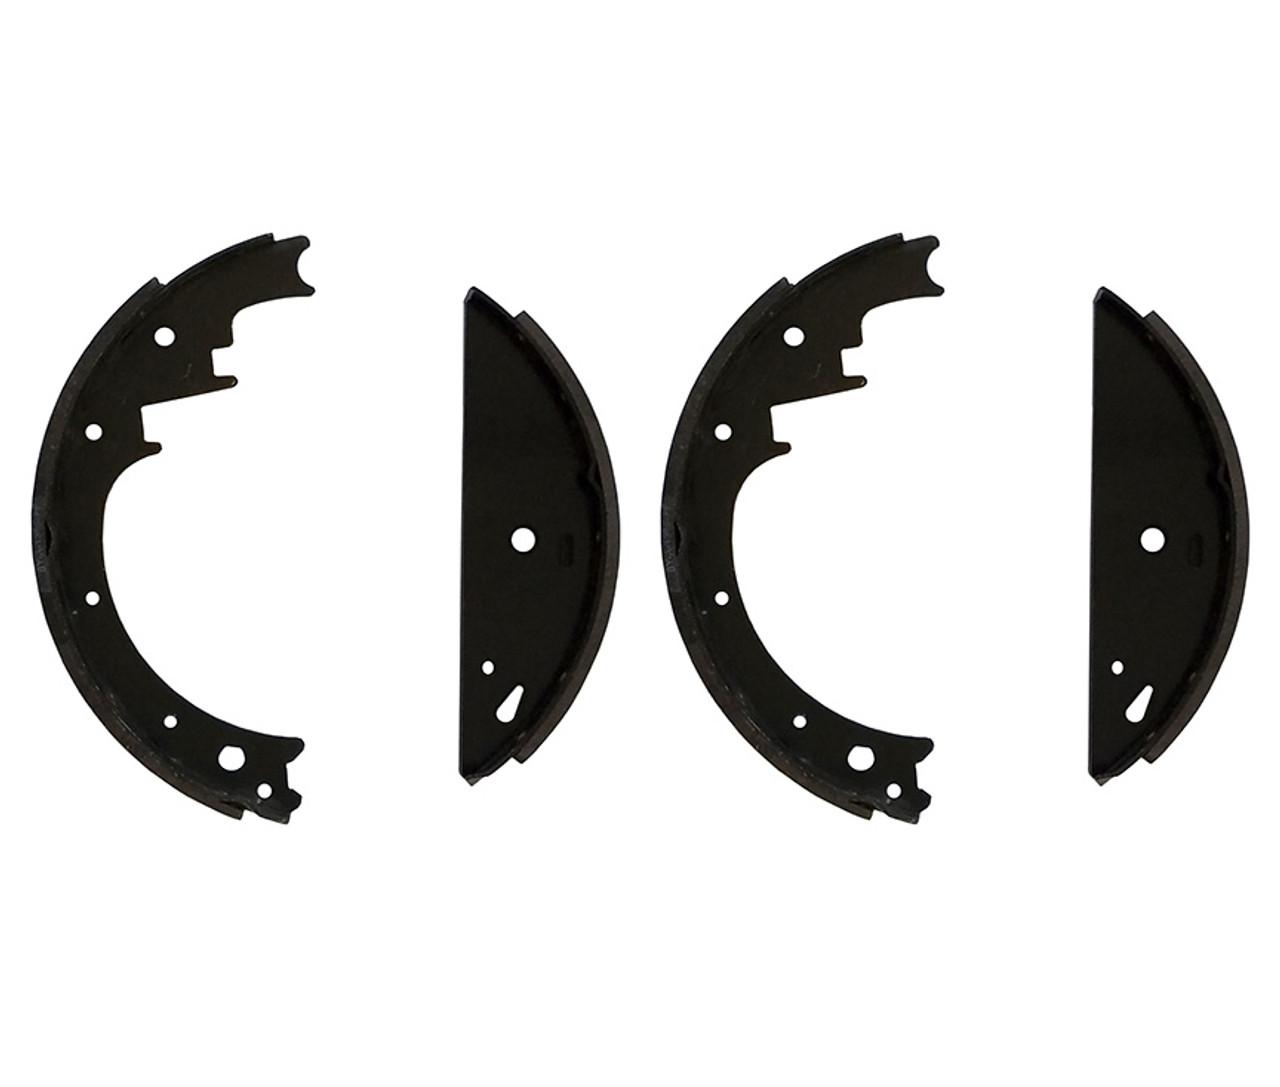 "7814 --- Shoe & Lining Kit for 12"" x 2"" Hydraulic Free Backing Brakes"